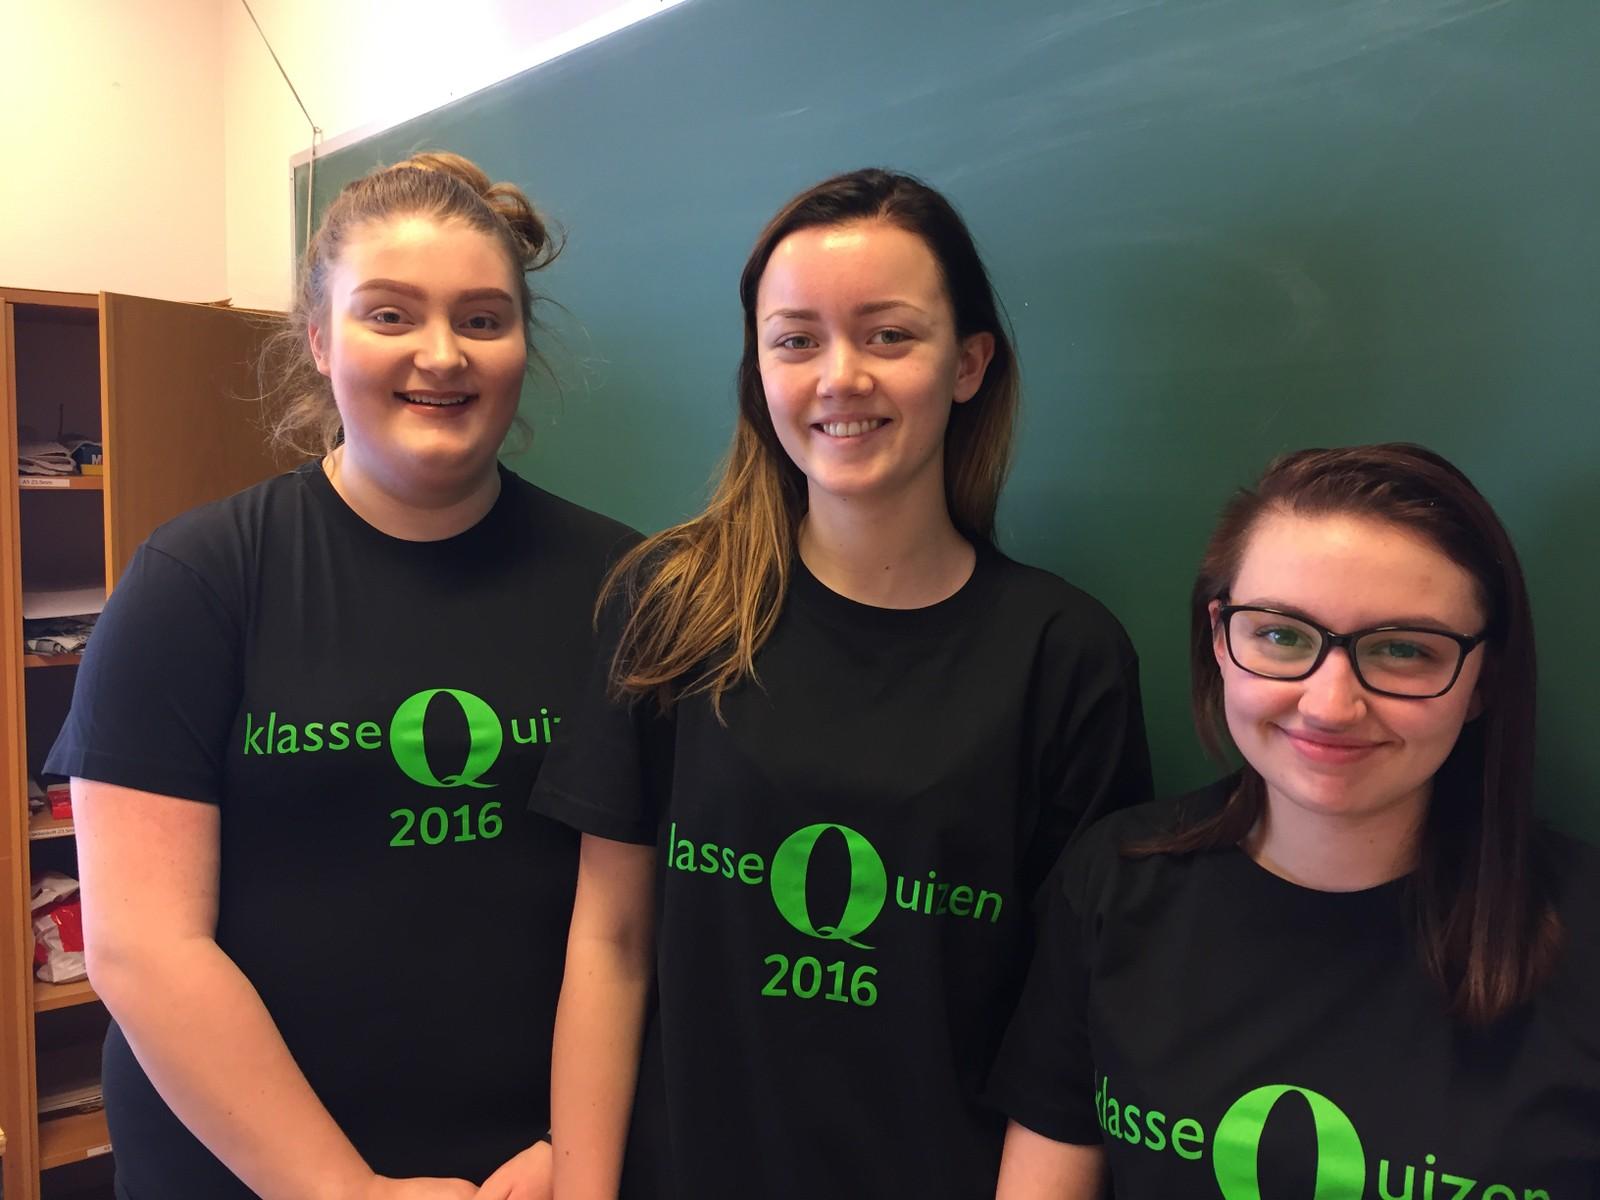 Jøa skole fikk 7 poeng i Klassequizen. Fra v. Frida Ulsund, Sarah Ørjasæter Forås og Bjørg Elisa Leithe Hugås.